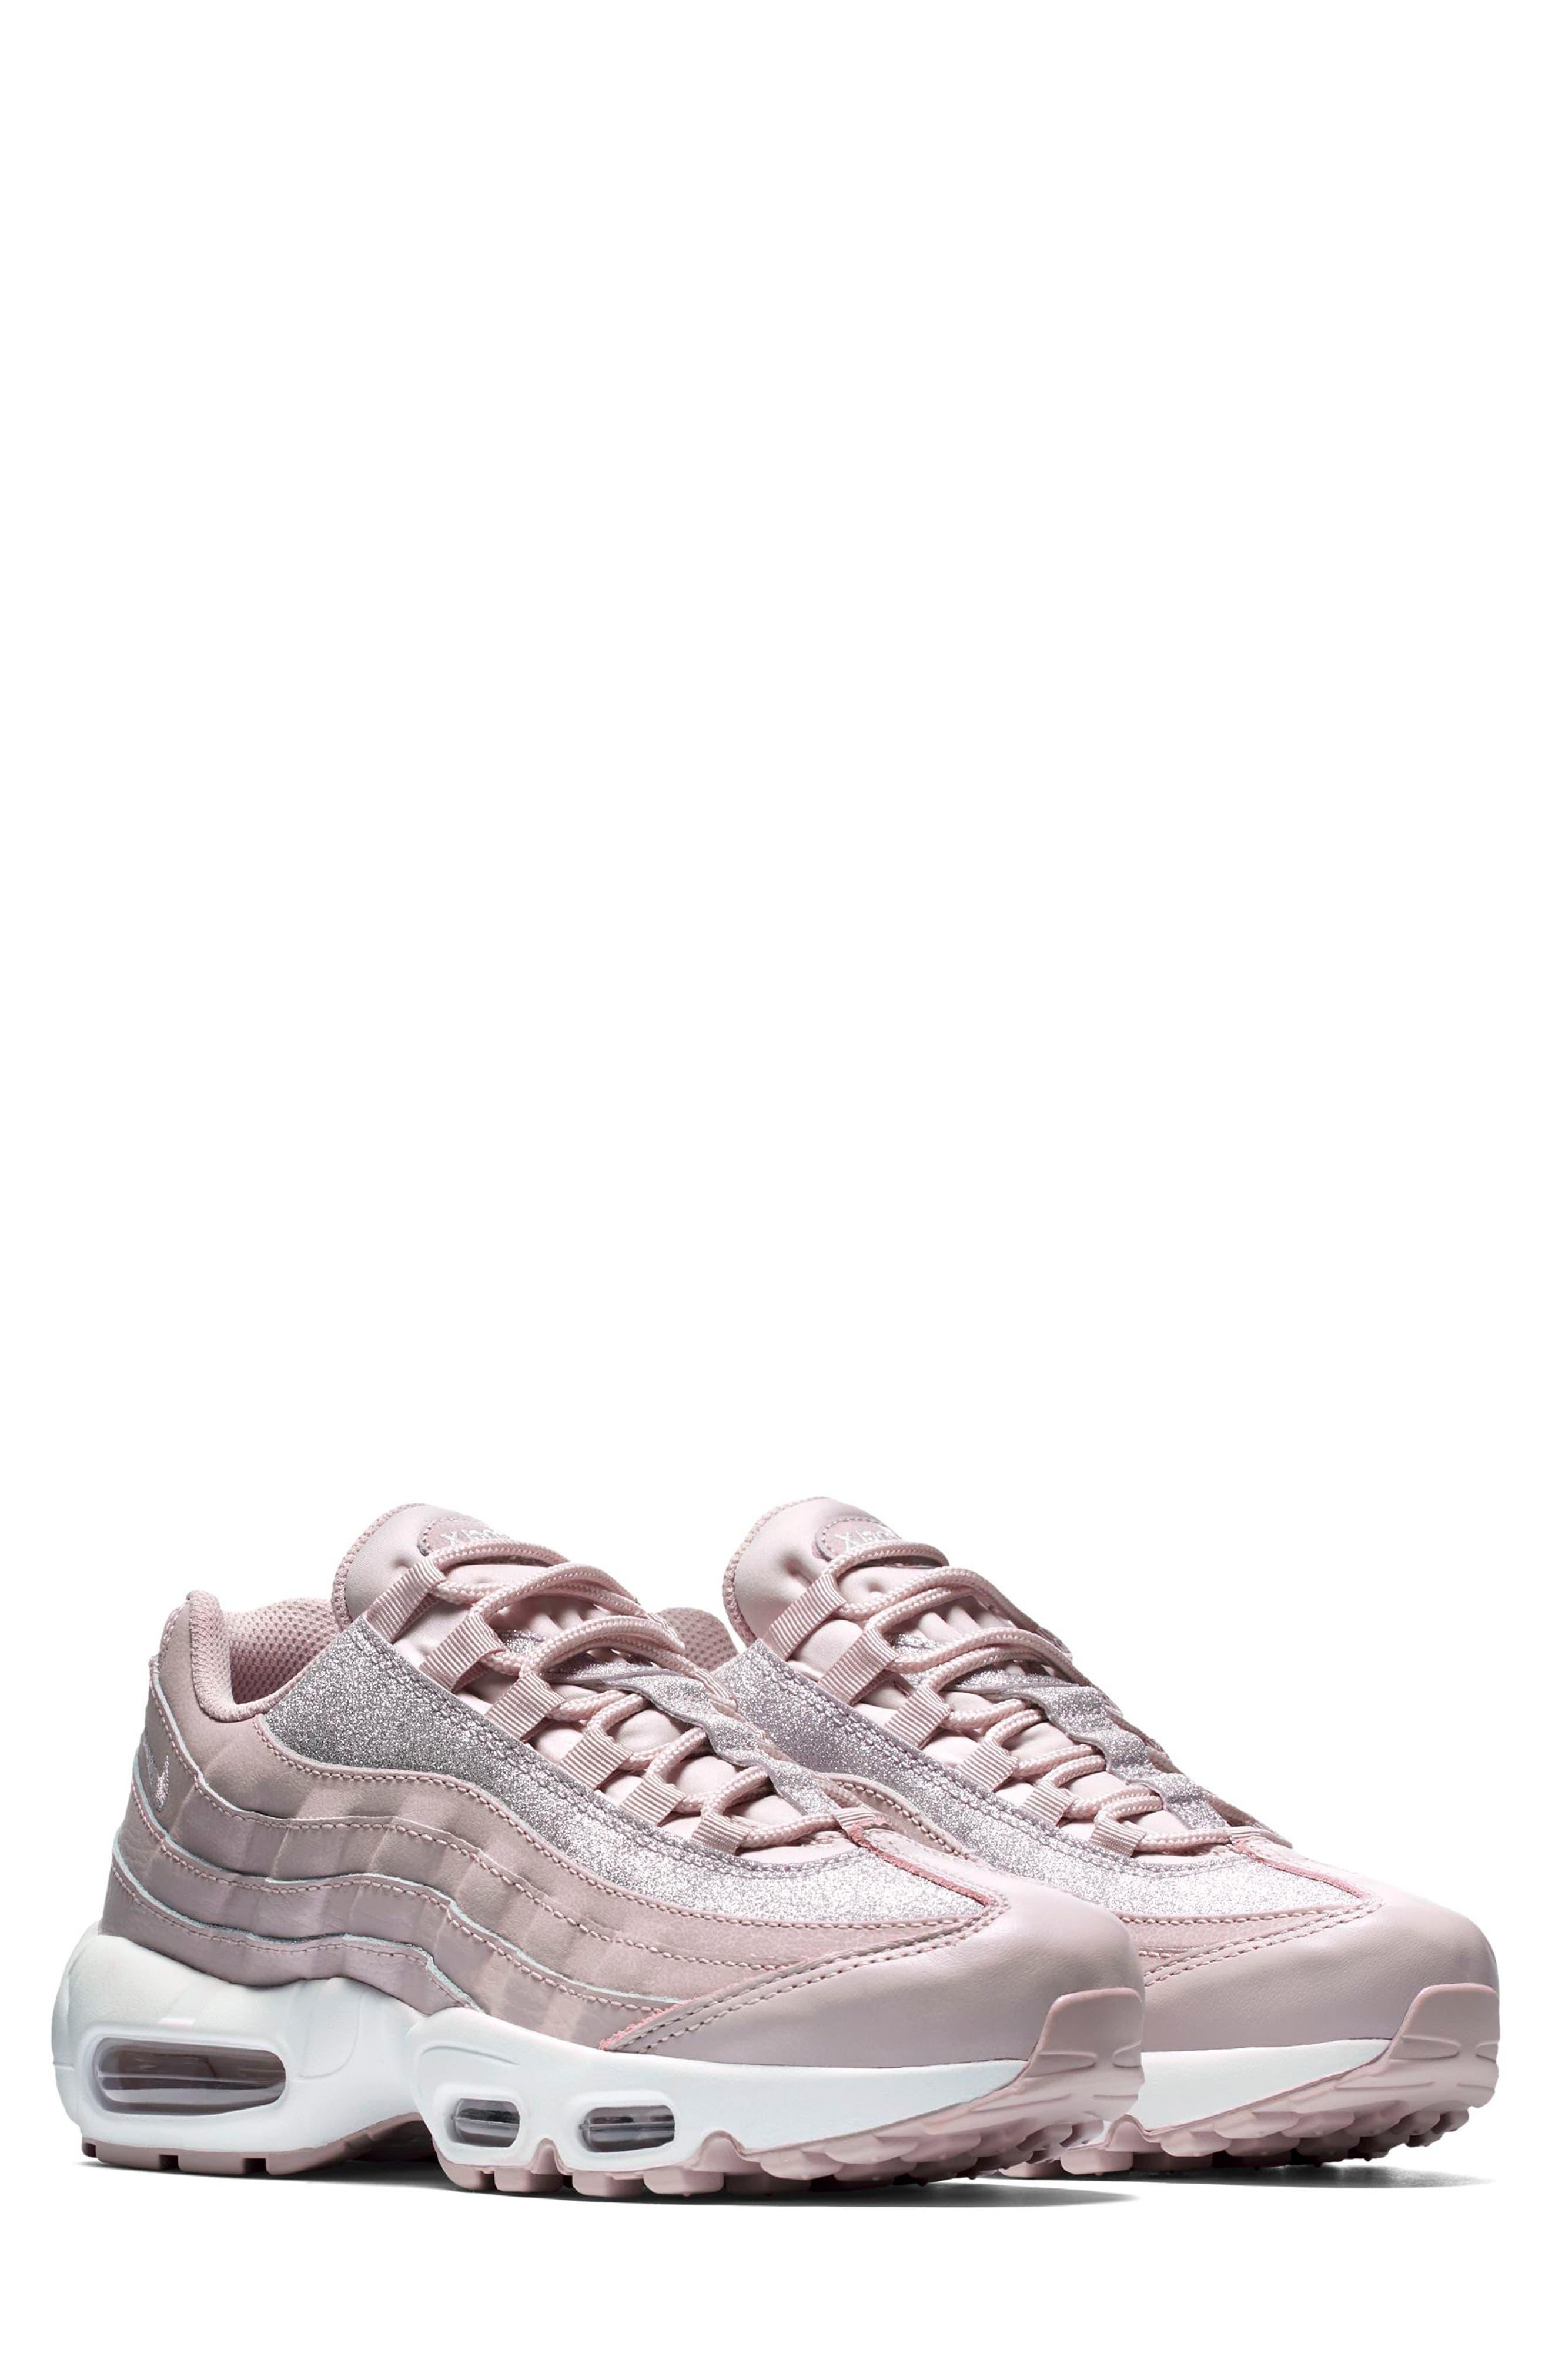 Air Max 95 Se Sneaker by Nike